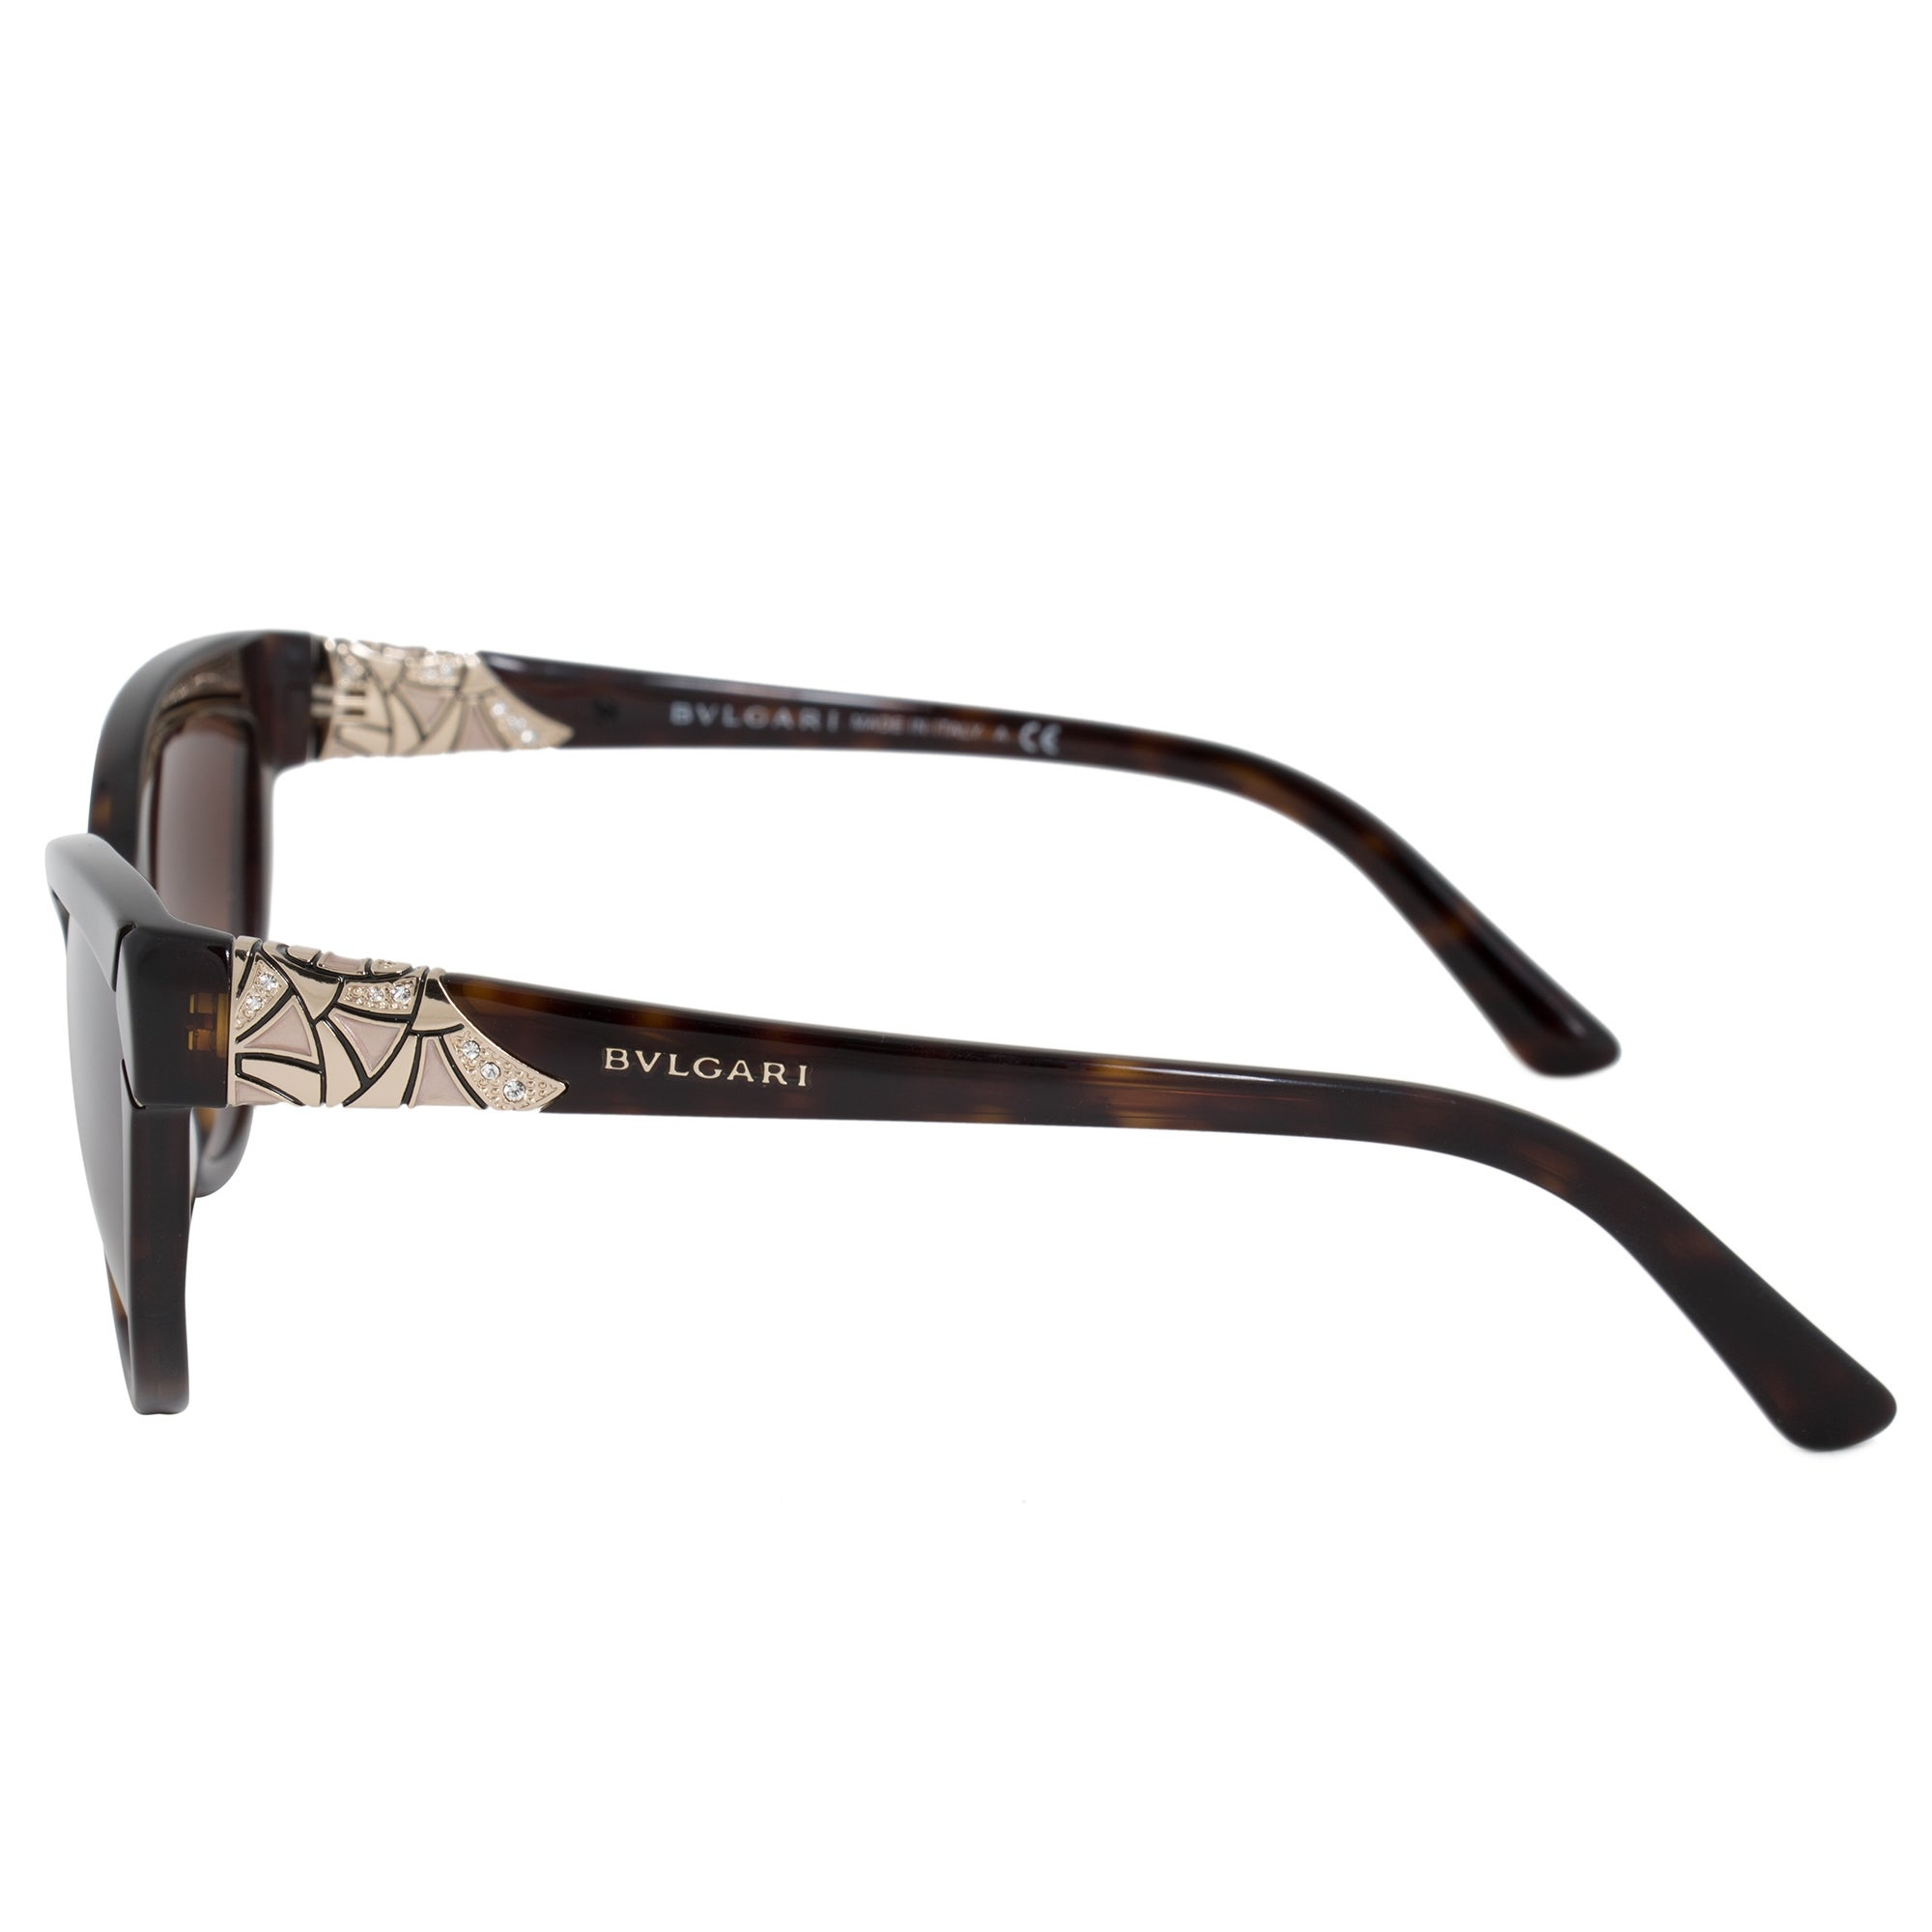 5109c7dbd5f Shop Bvlgari Butterfly Sunglasses BV8156B 50413 54 - Free Shipping Today -  Overstock.com - 21408823